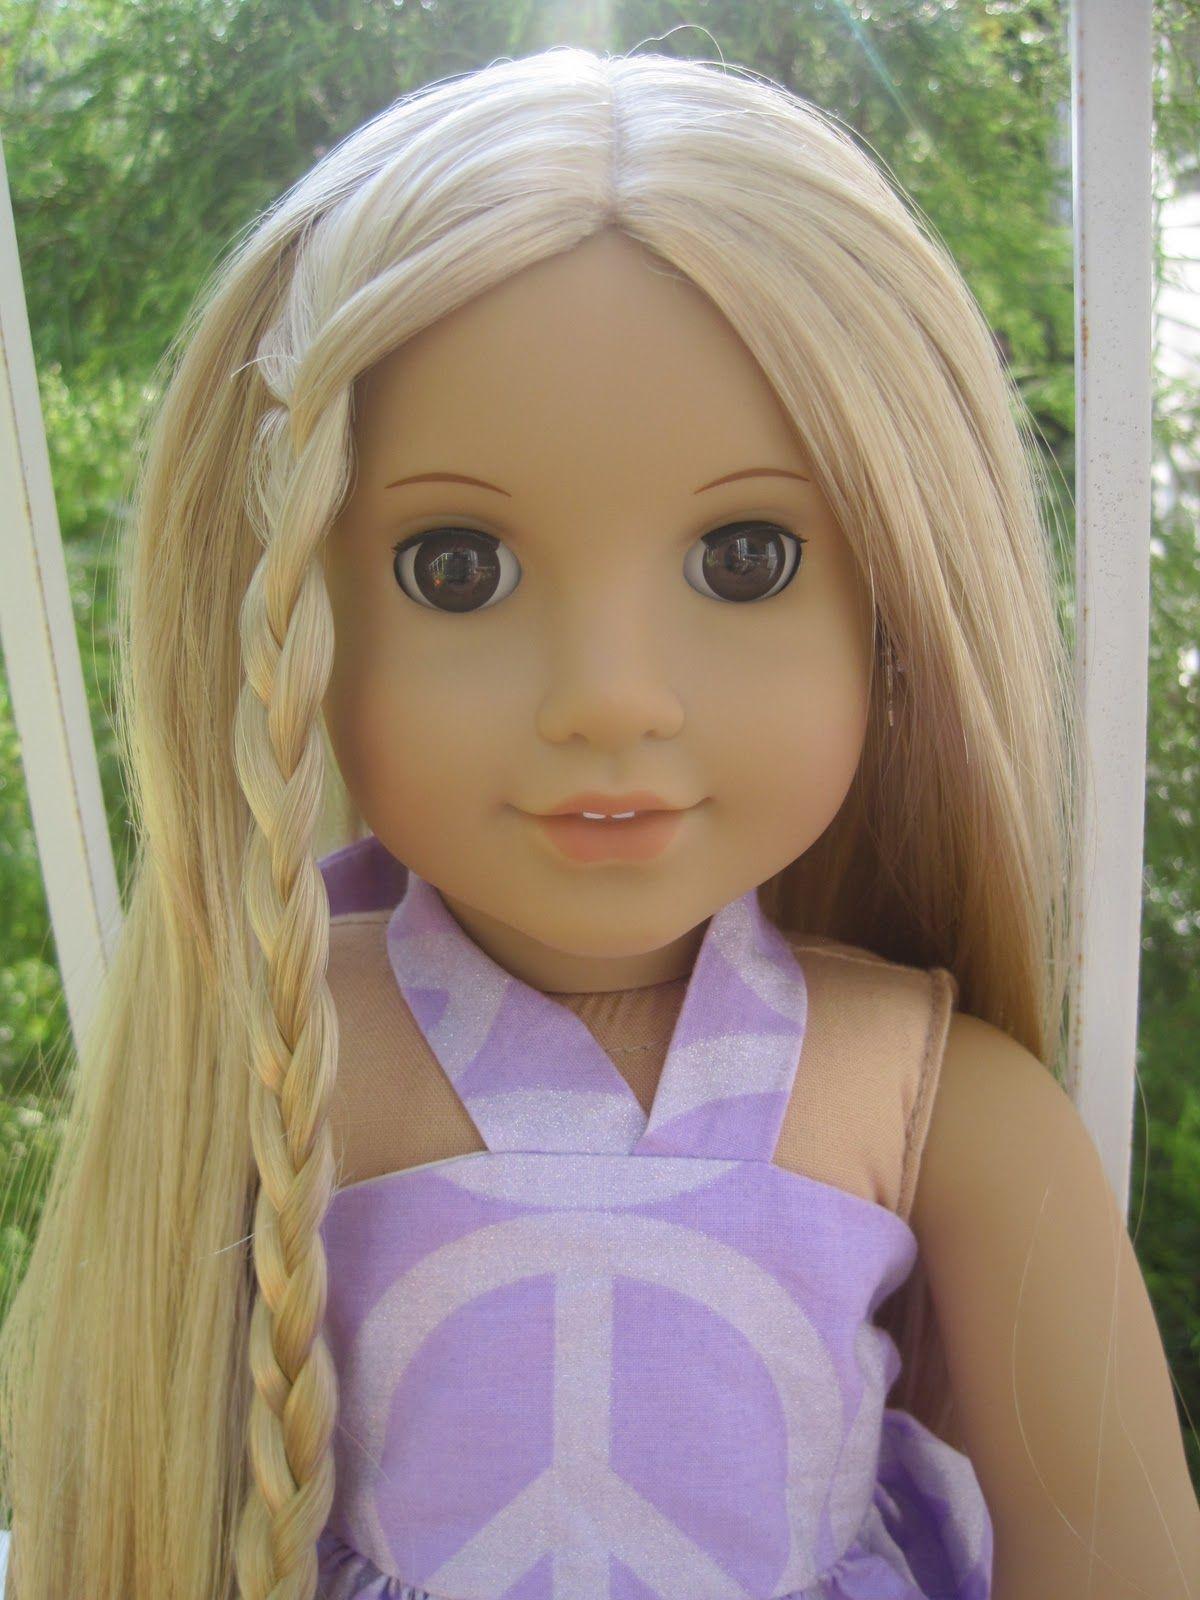 American Girl Doll Julie Albright in Original Box - F6306 ...  |American Doll Julie Albright